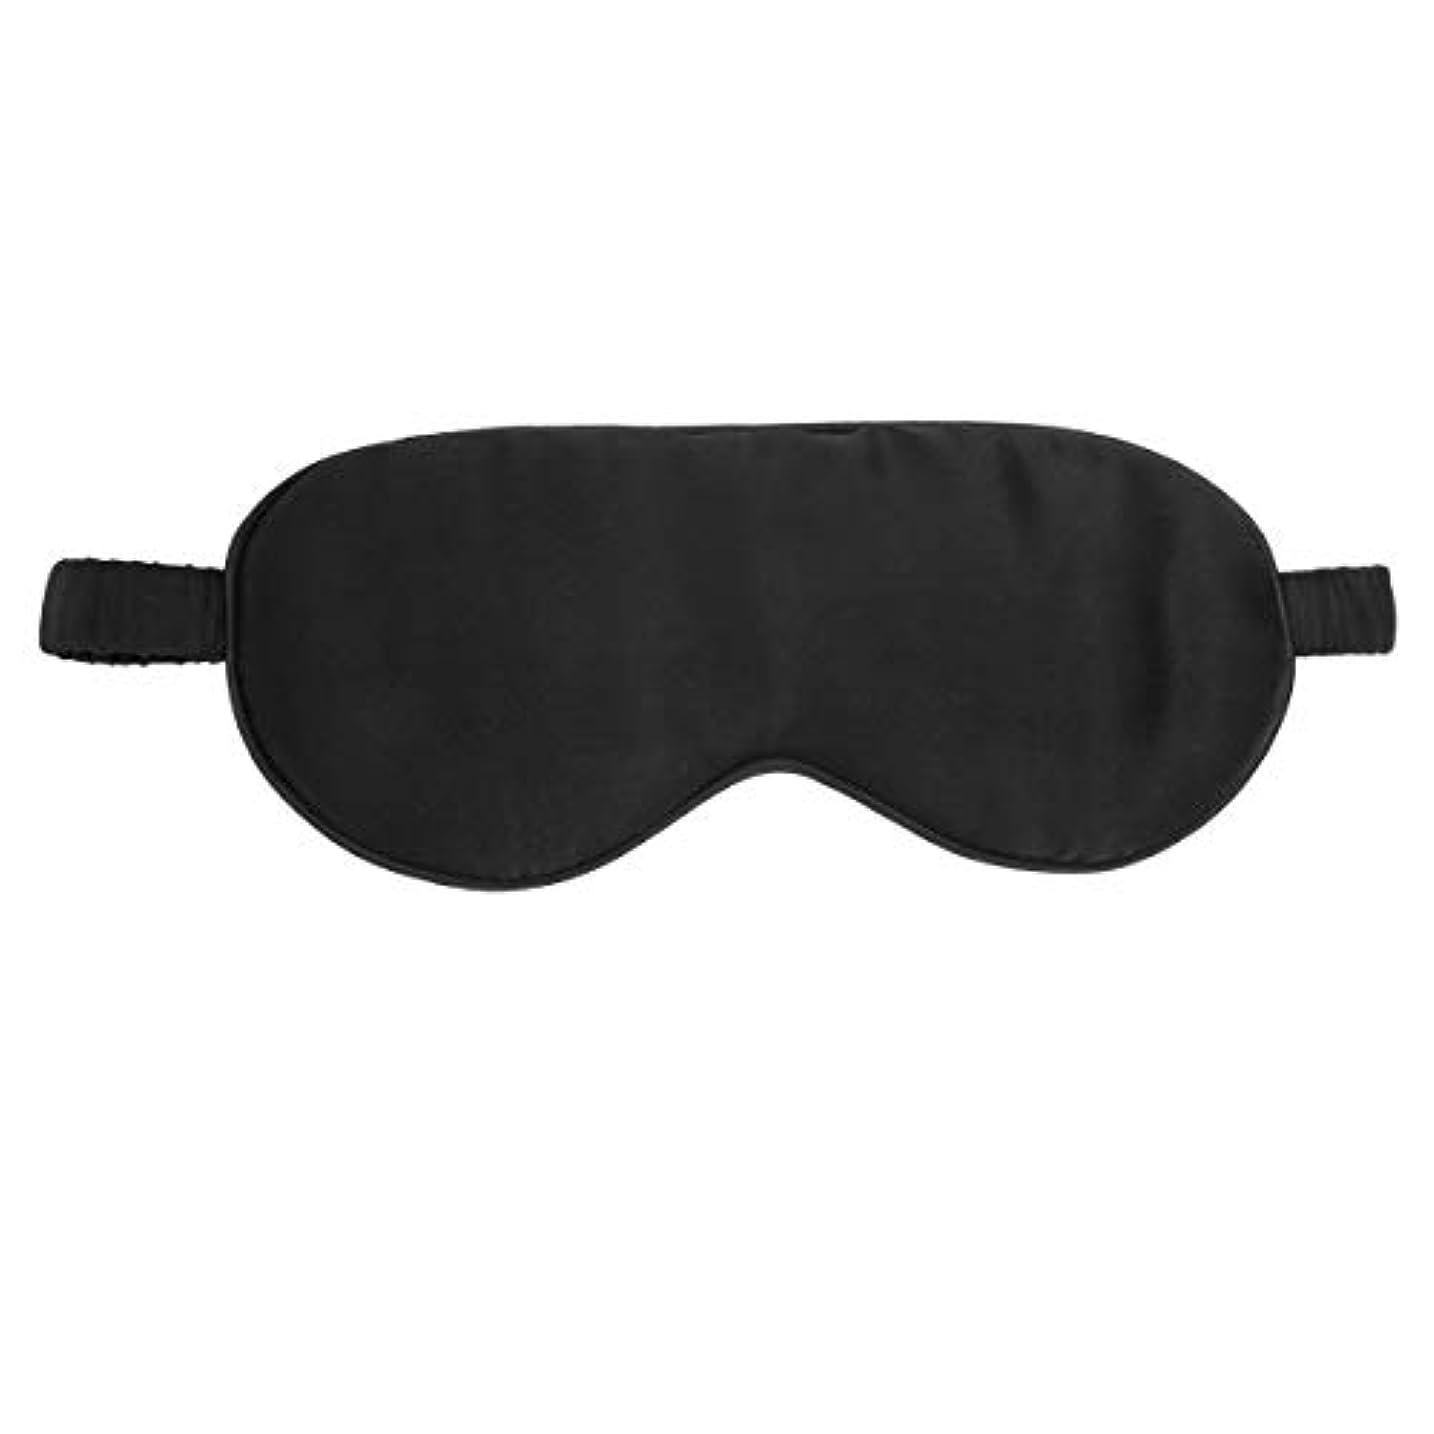 SUPVOX アイマスク 安眠アイマスク 睡眠 遮光 マスク シルク 圧迫感なし 目に優しい 軽量 旅行 飛行機 疲労回復 男女兼用